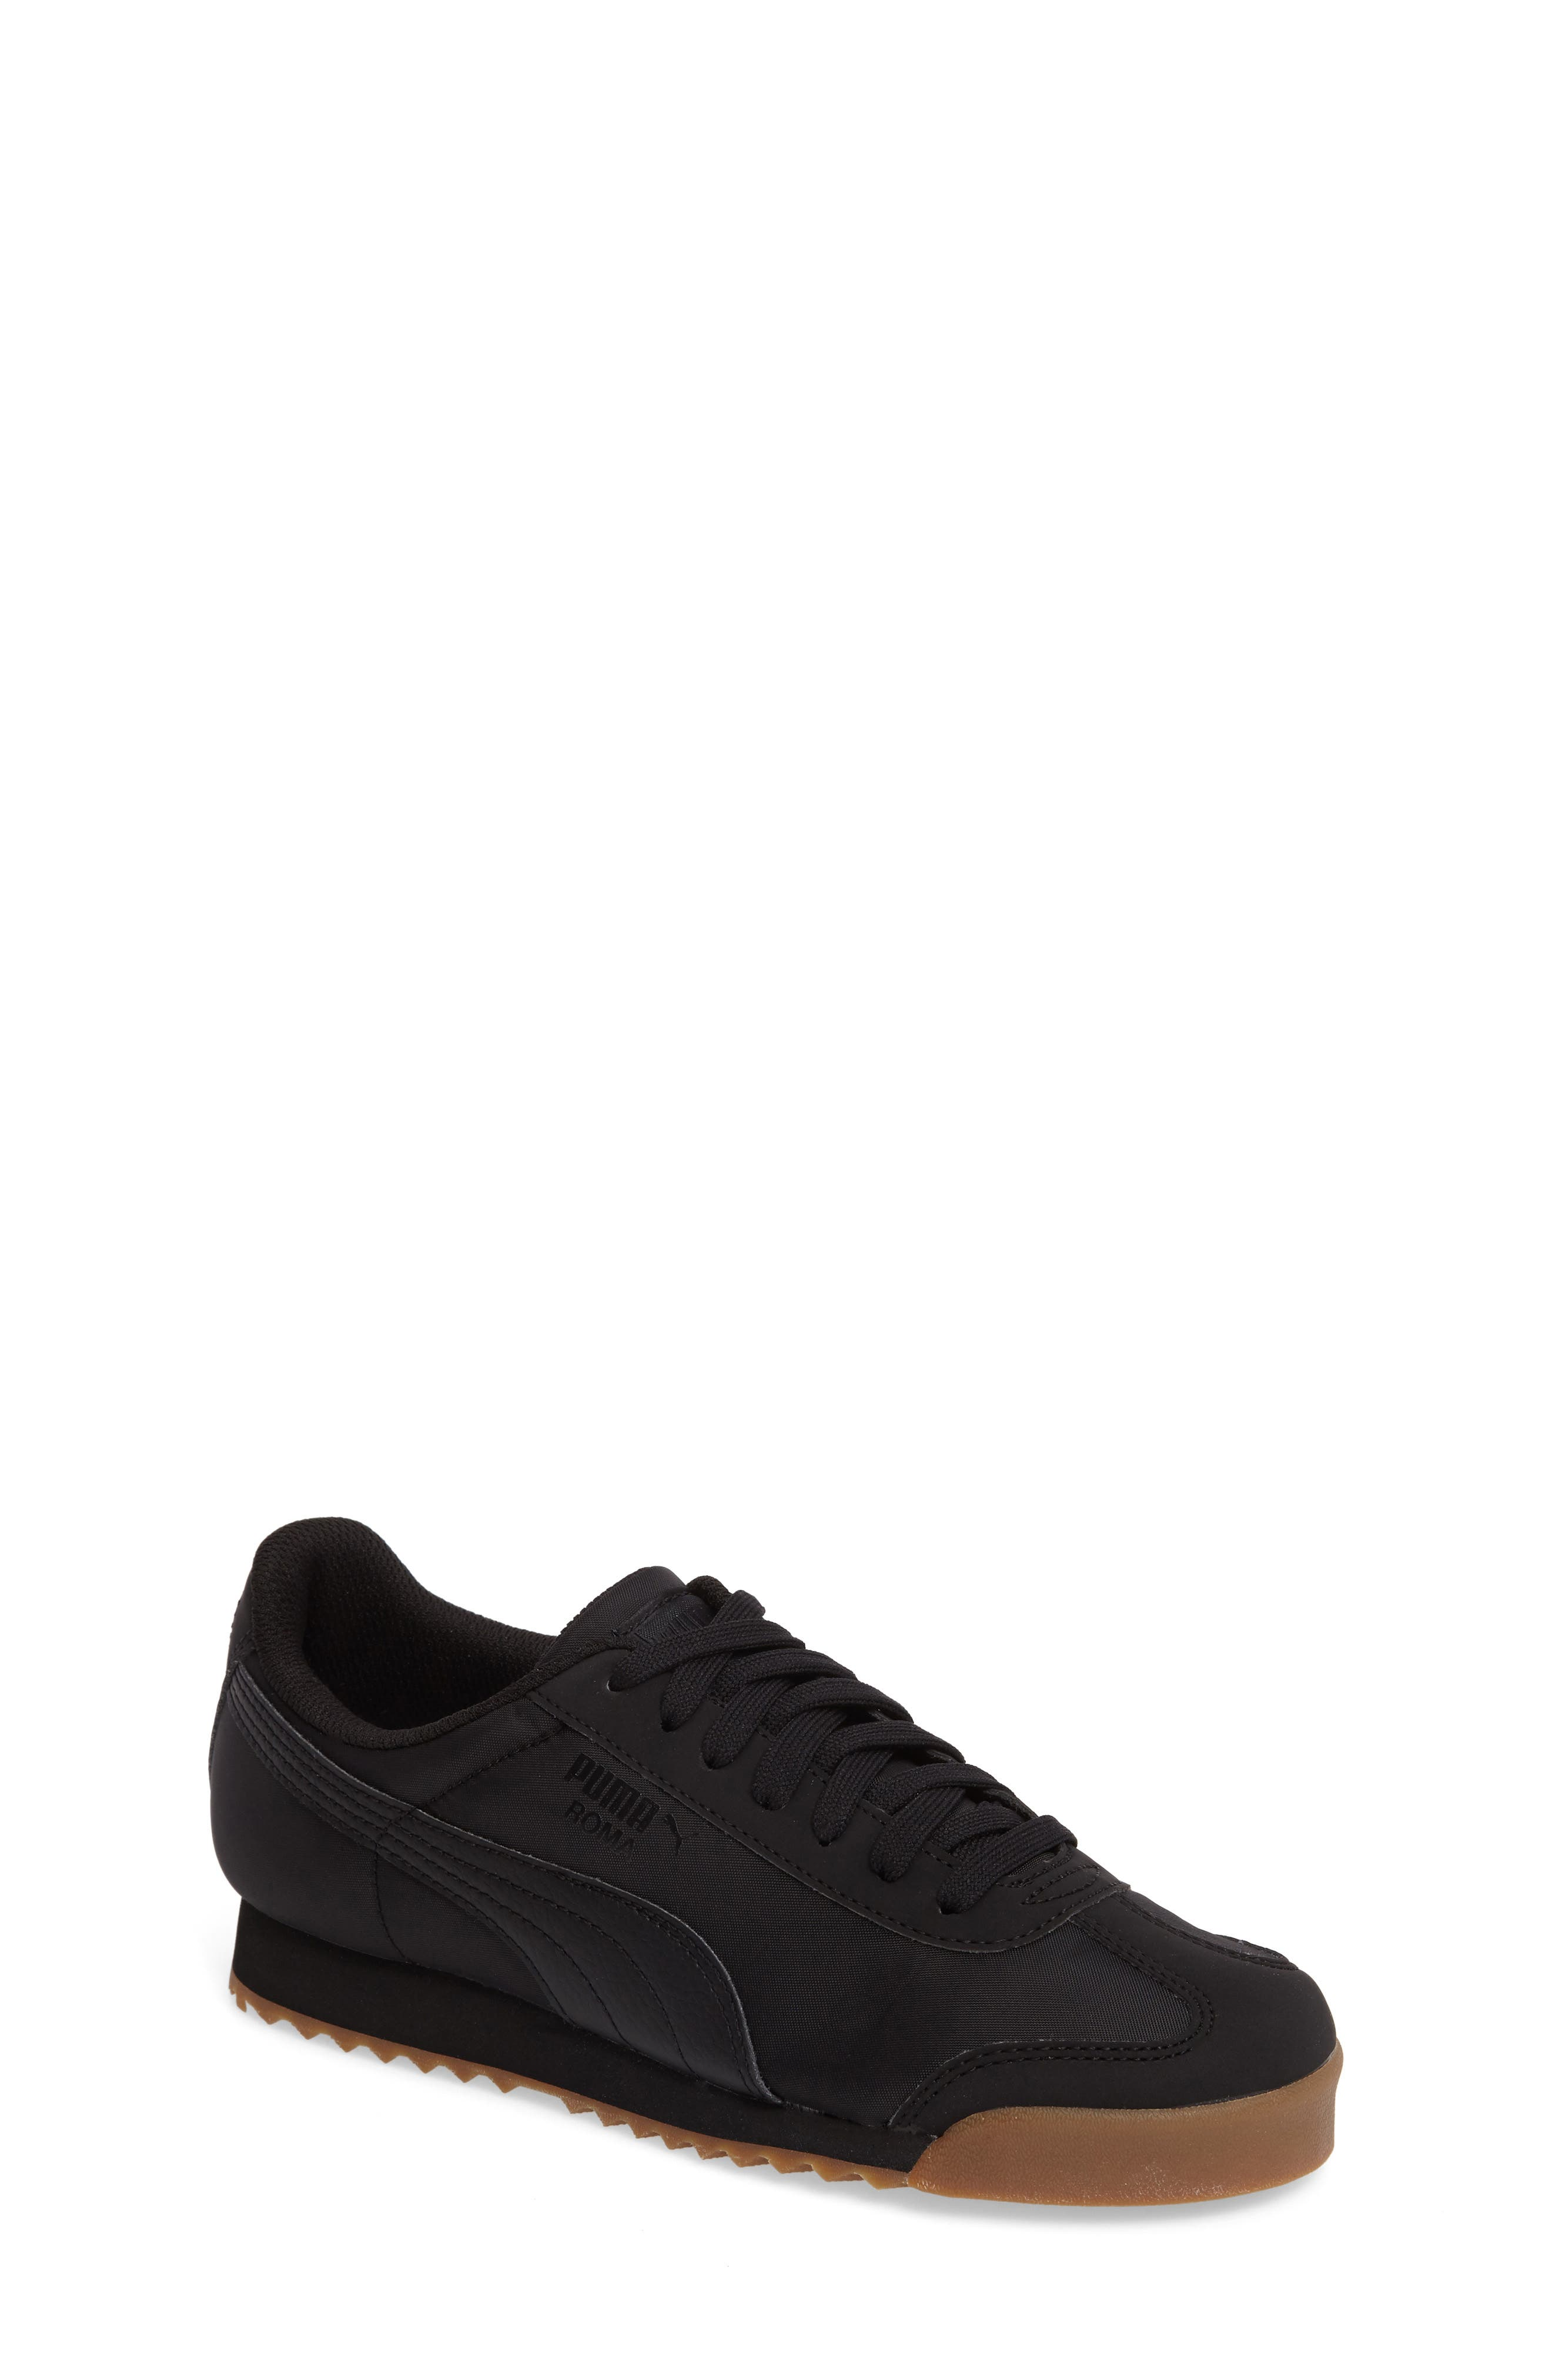 Roma Basic Summer Sneaker,                             Main thumbnail 1, color,                             001